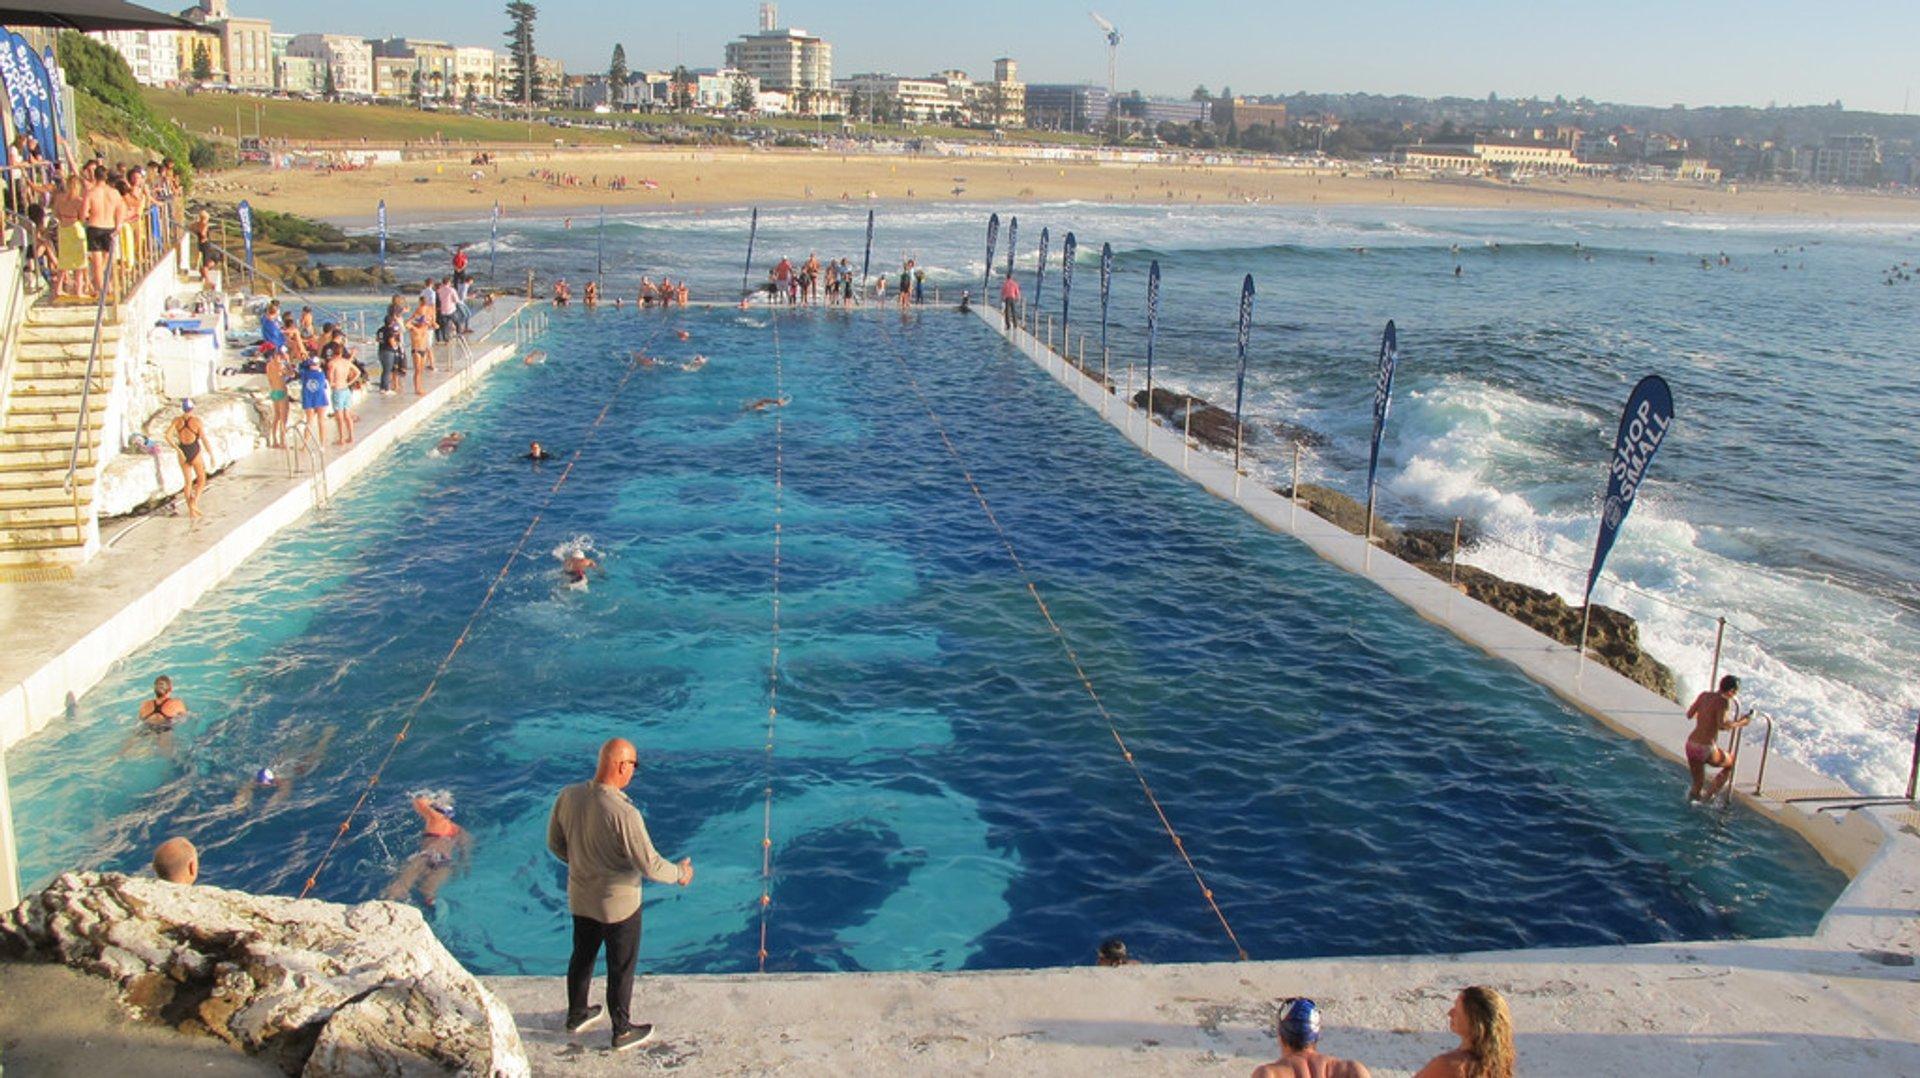 Bondi Icebergs Pool in Sydney - Best Season 2020